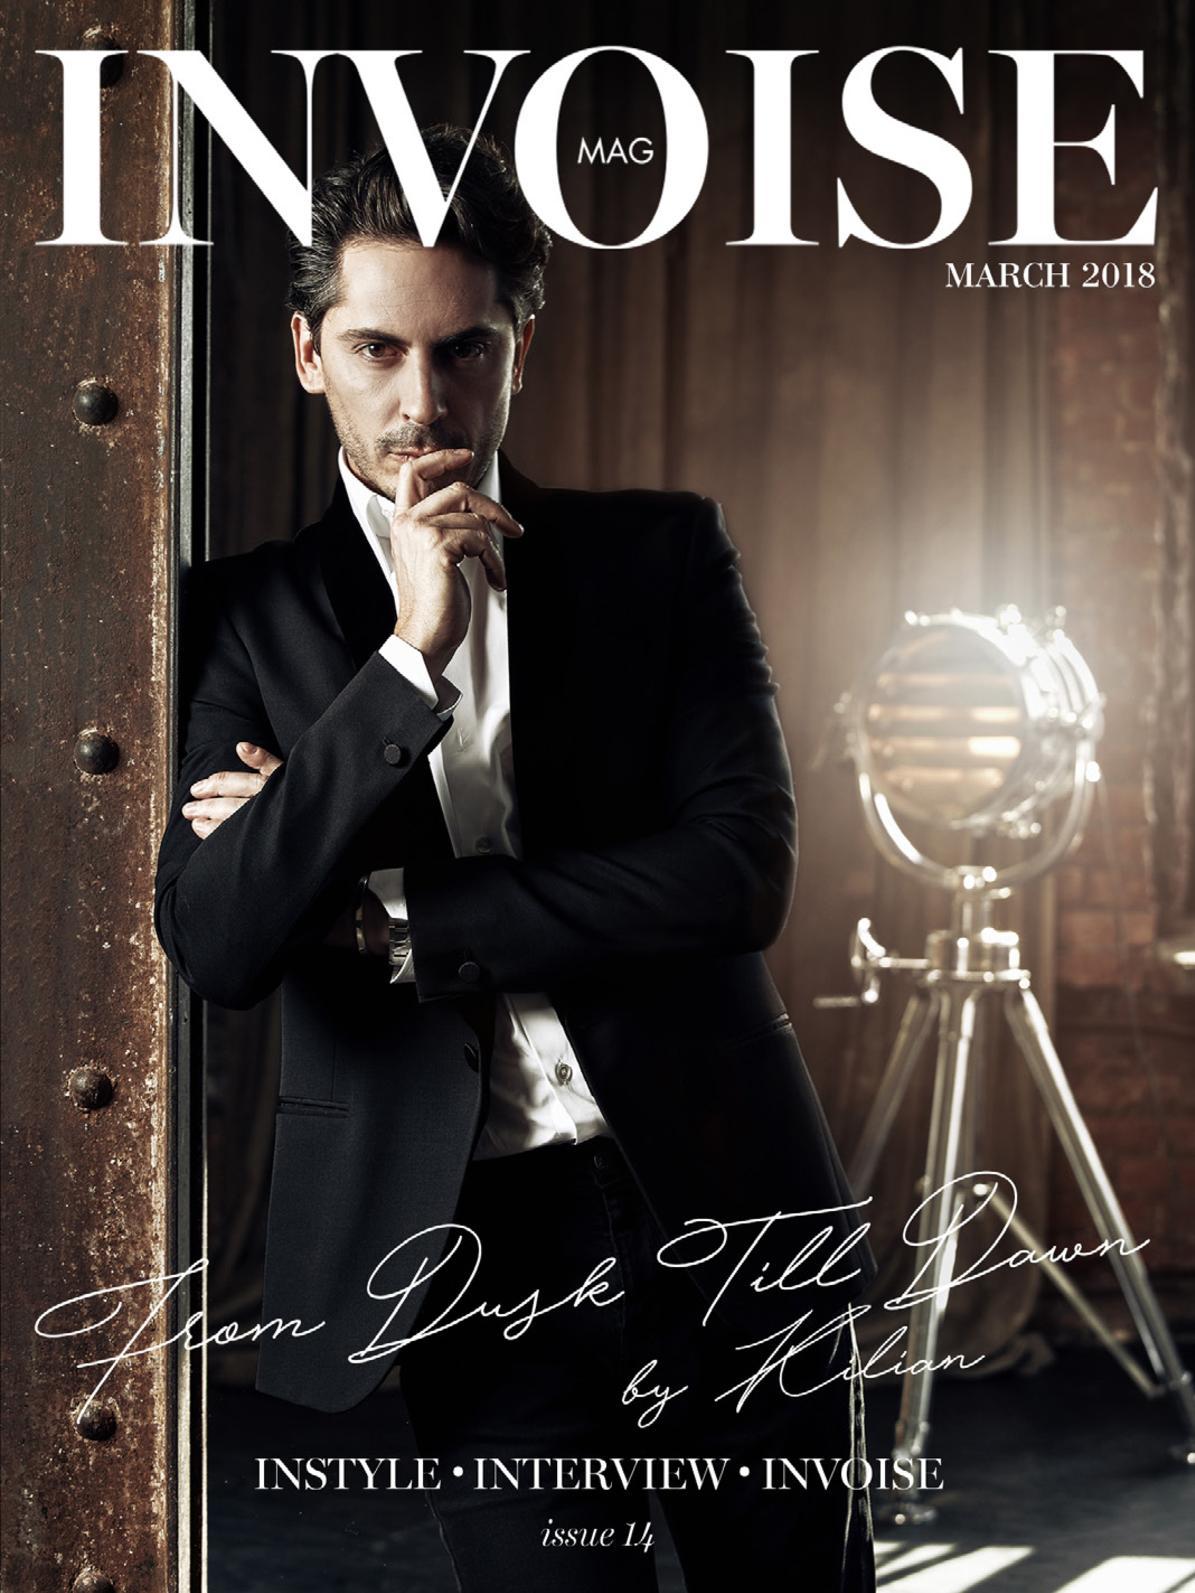 INVOISE Magazine #14